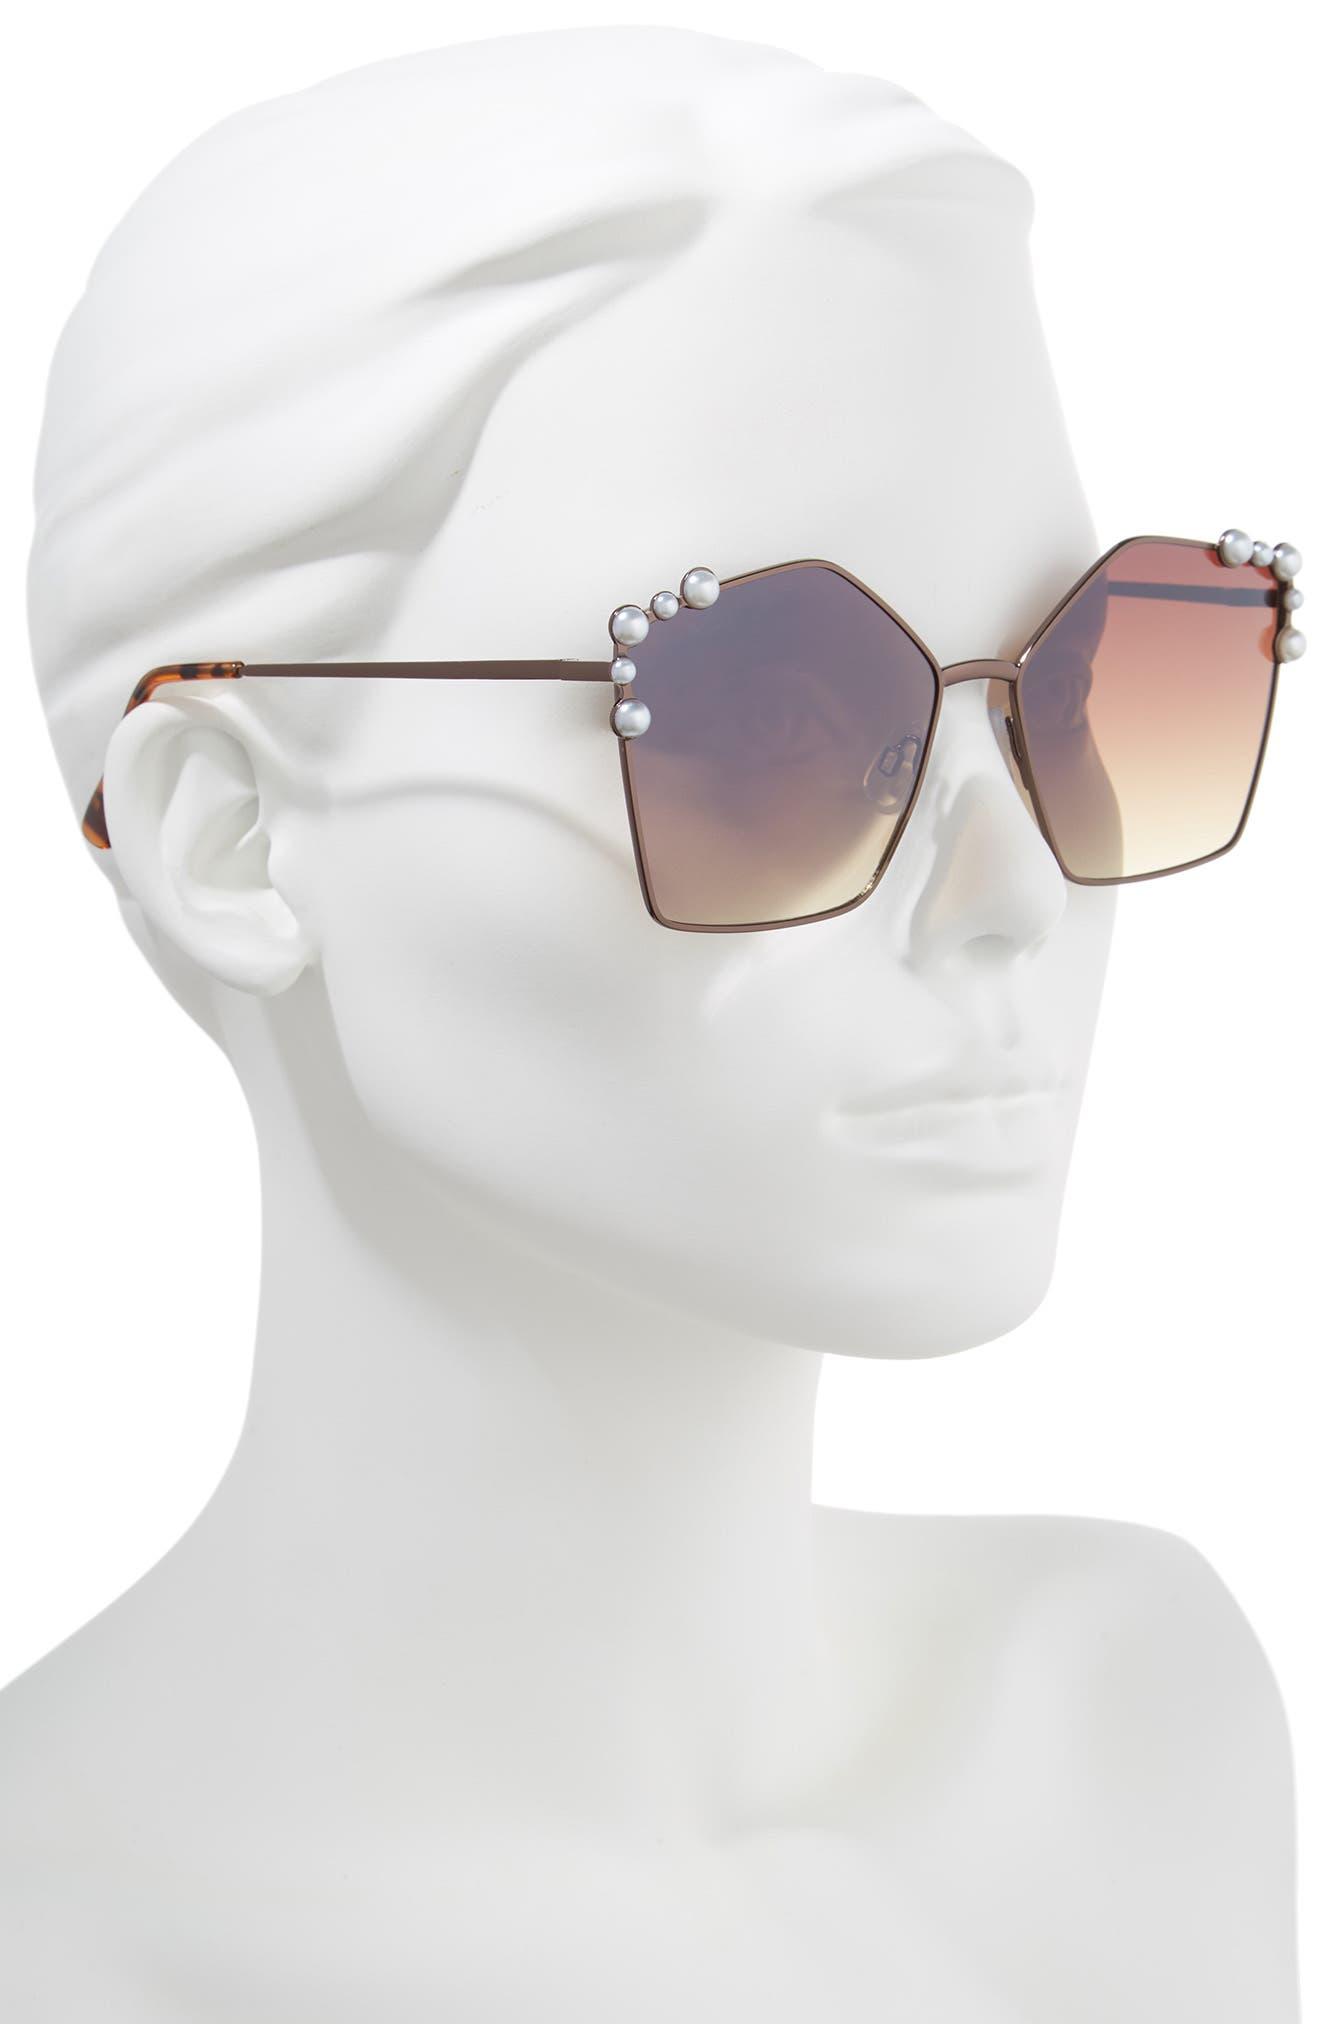 60mm Imitation Pearl Geometric Sunglasses,                             Alternate thumbnail 2, color,                             Brown/ Brown